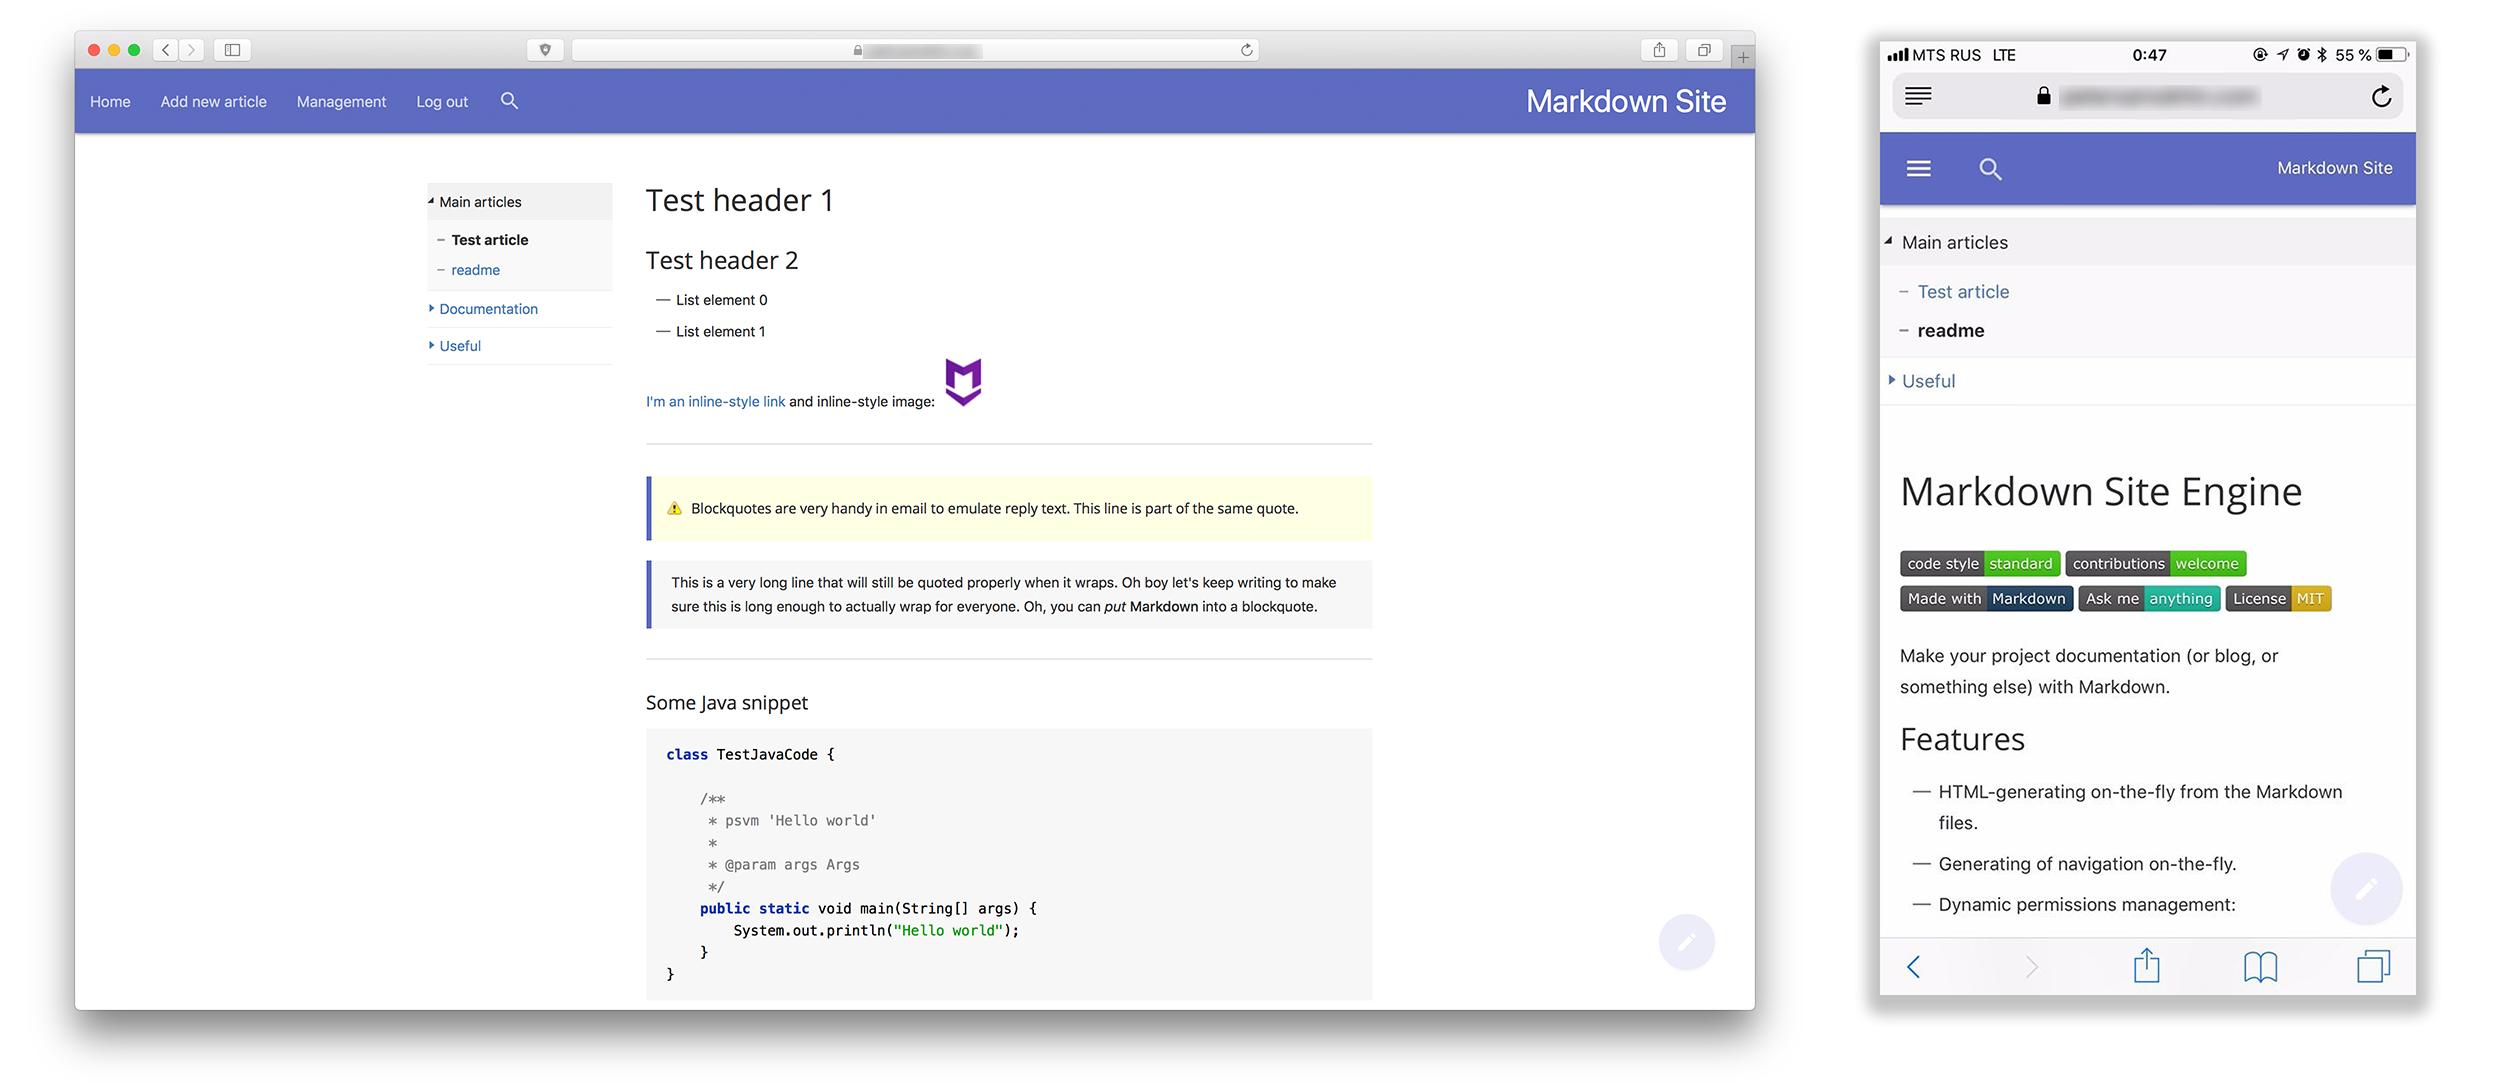 Markdown база знаний (или блог, или документация проекта) - 1